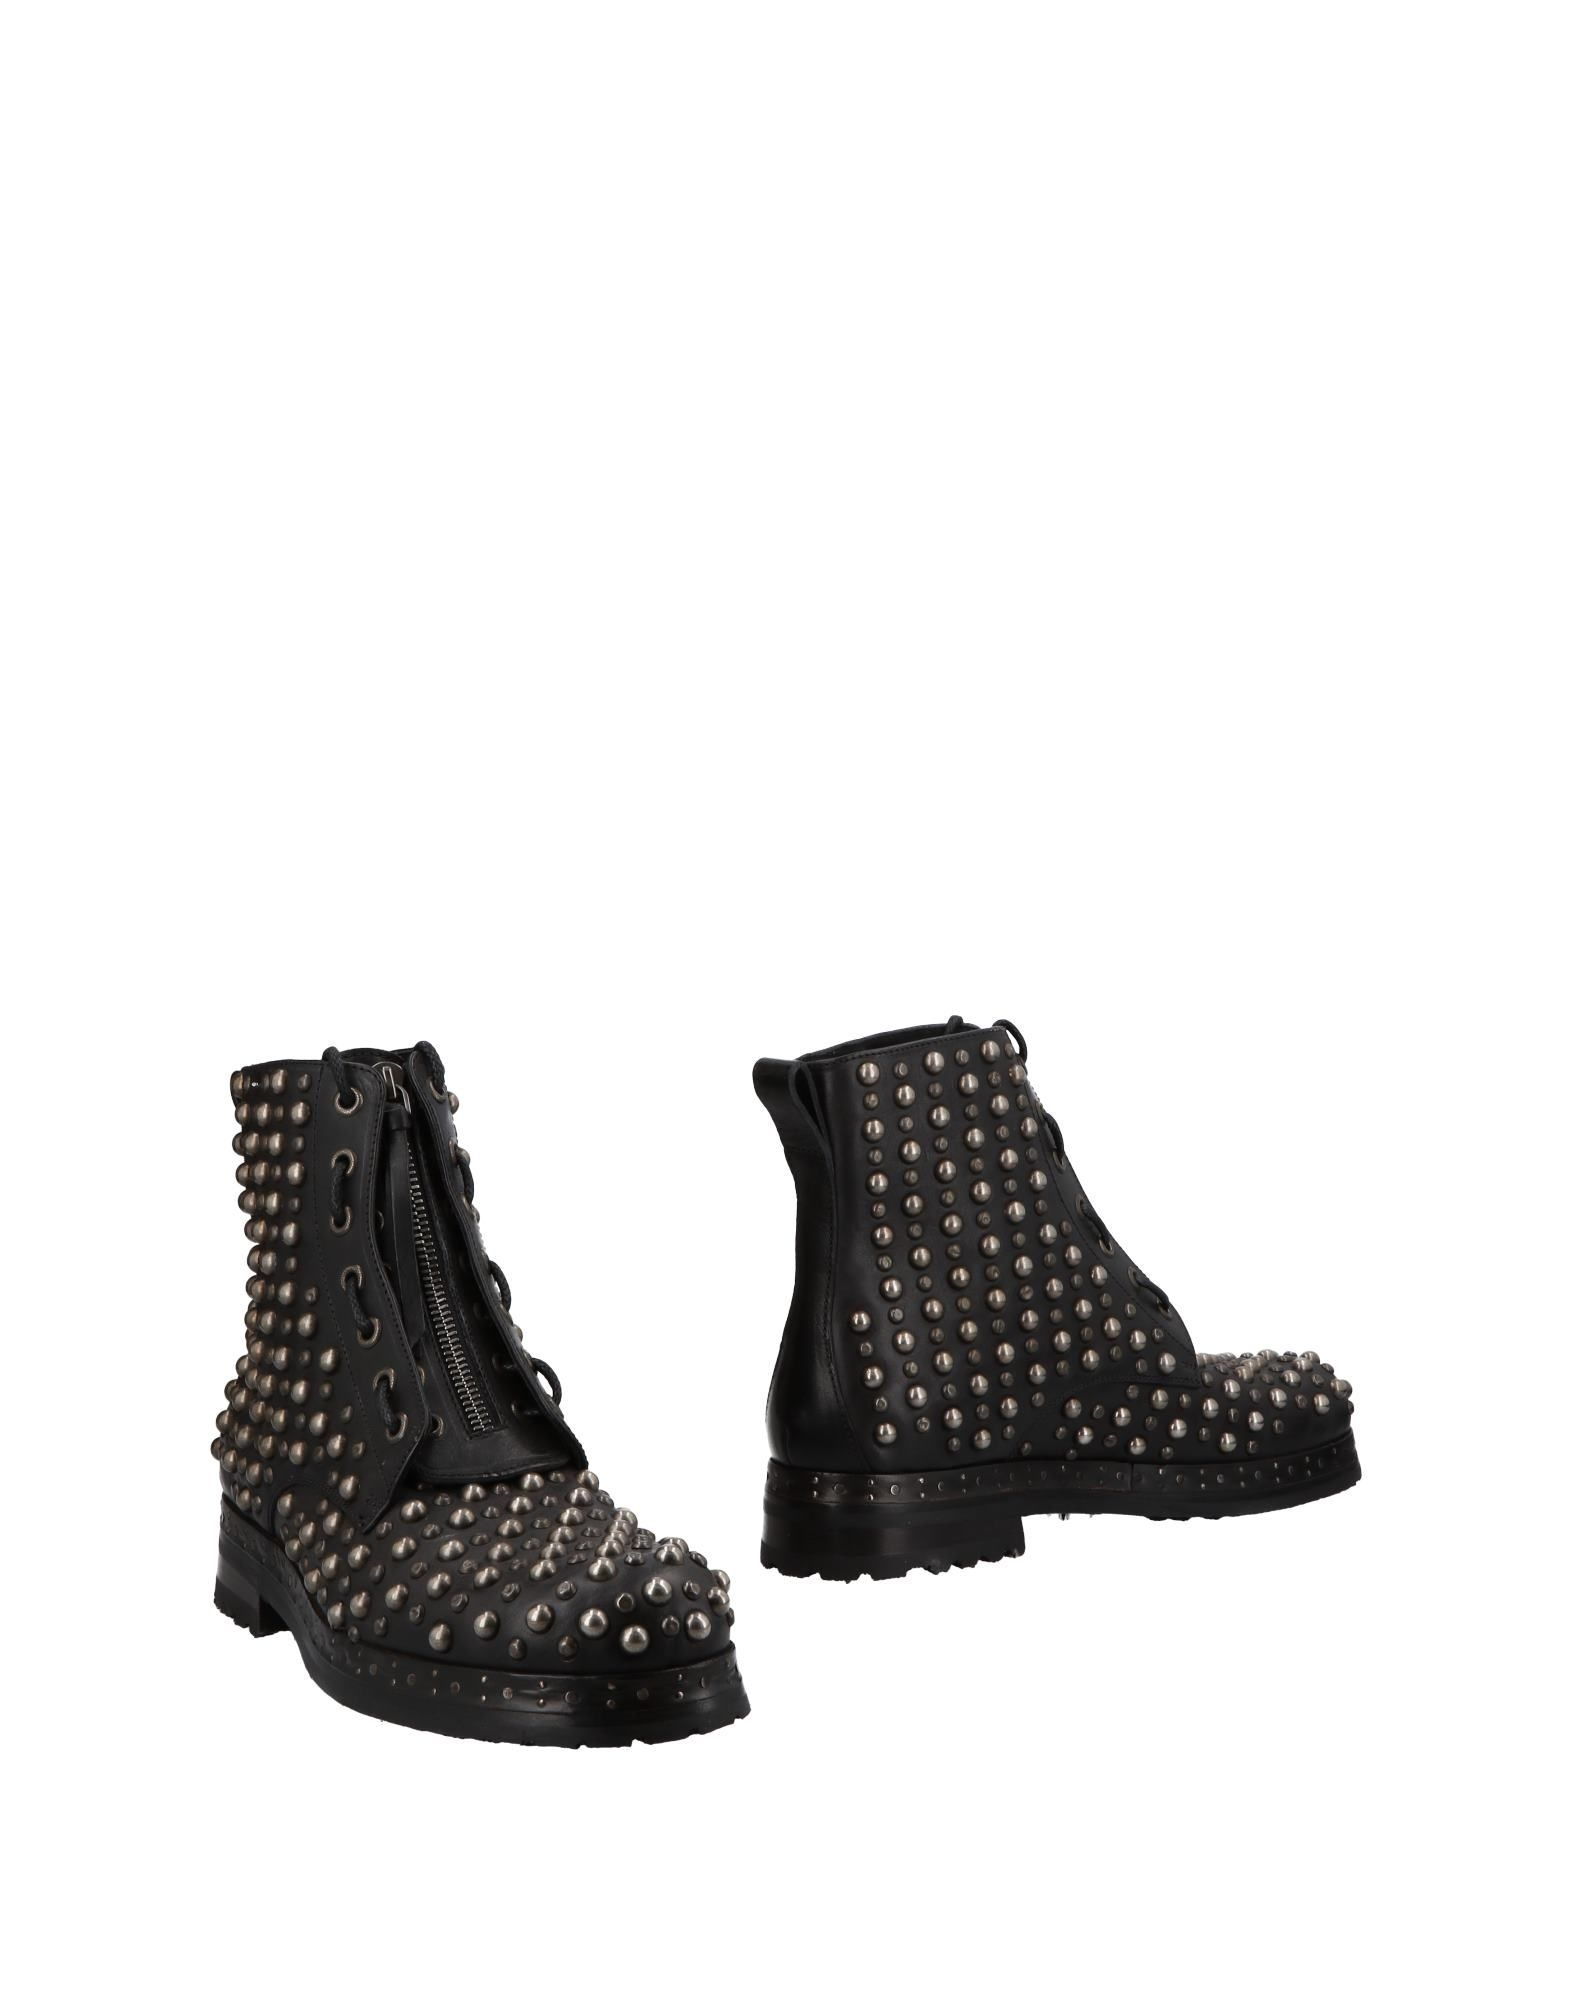 Dolce & Gabbana Stiefelette Herren  Schuhe 11488737QK Gute Qualität beliebte Schuhe  b310e8